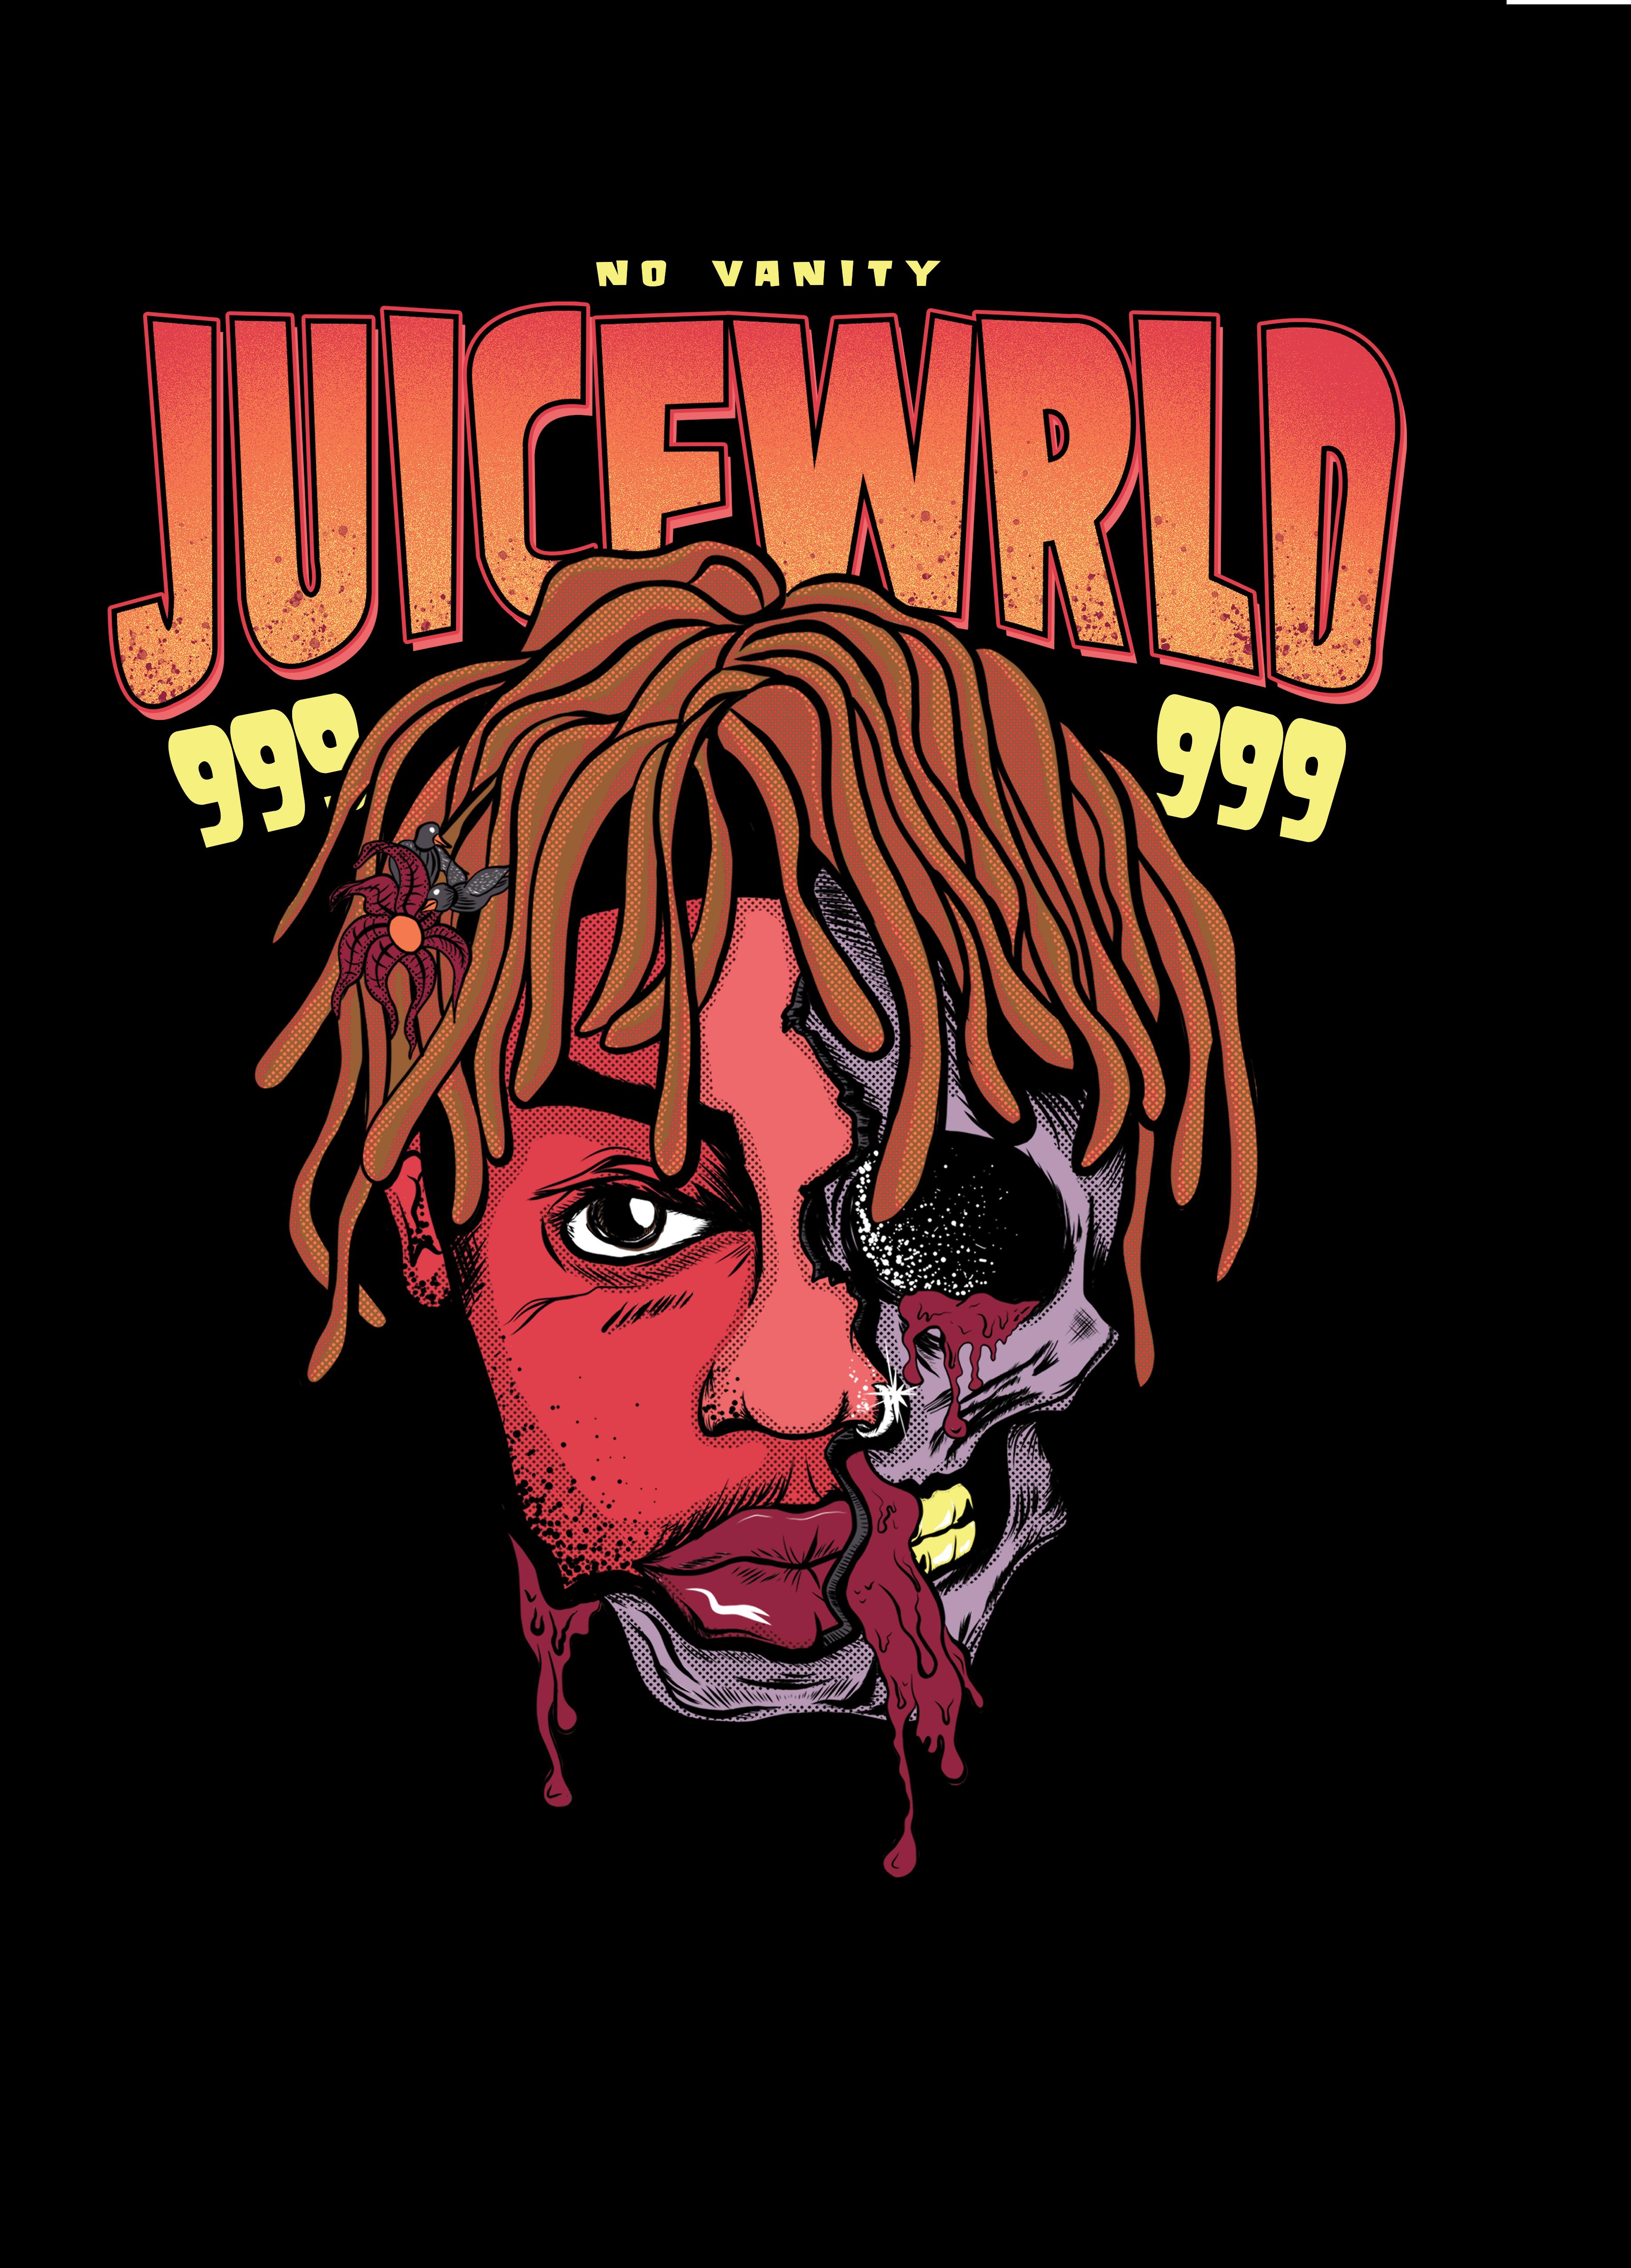 Juice wrld skull poster (With images) Rapper art, Poster